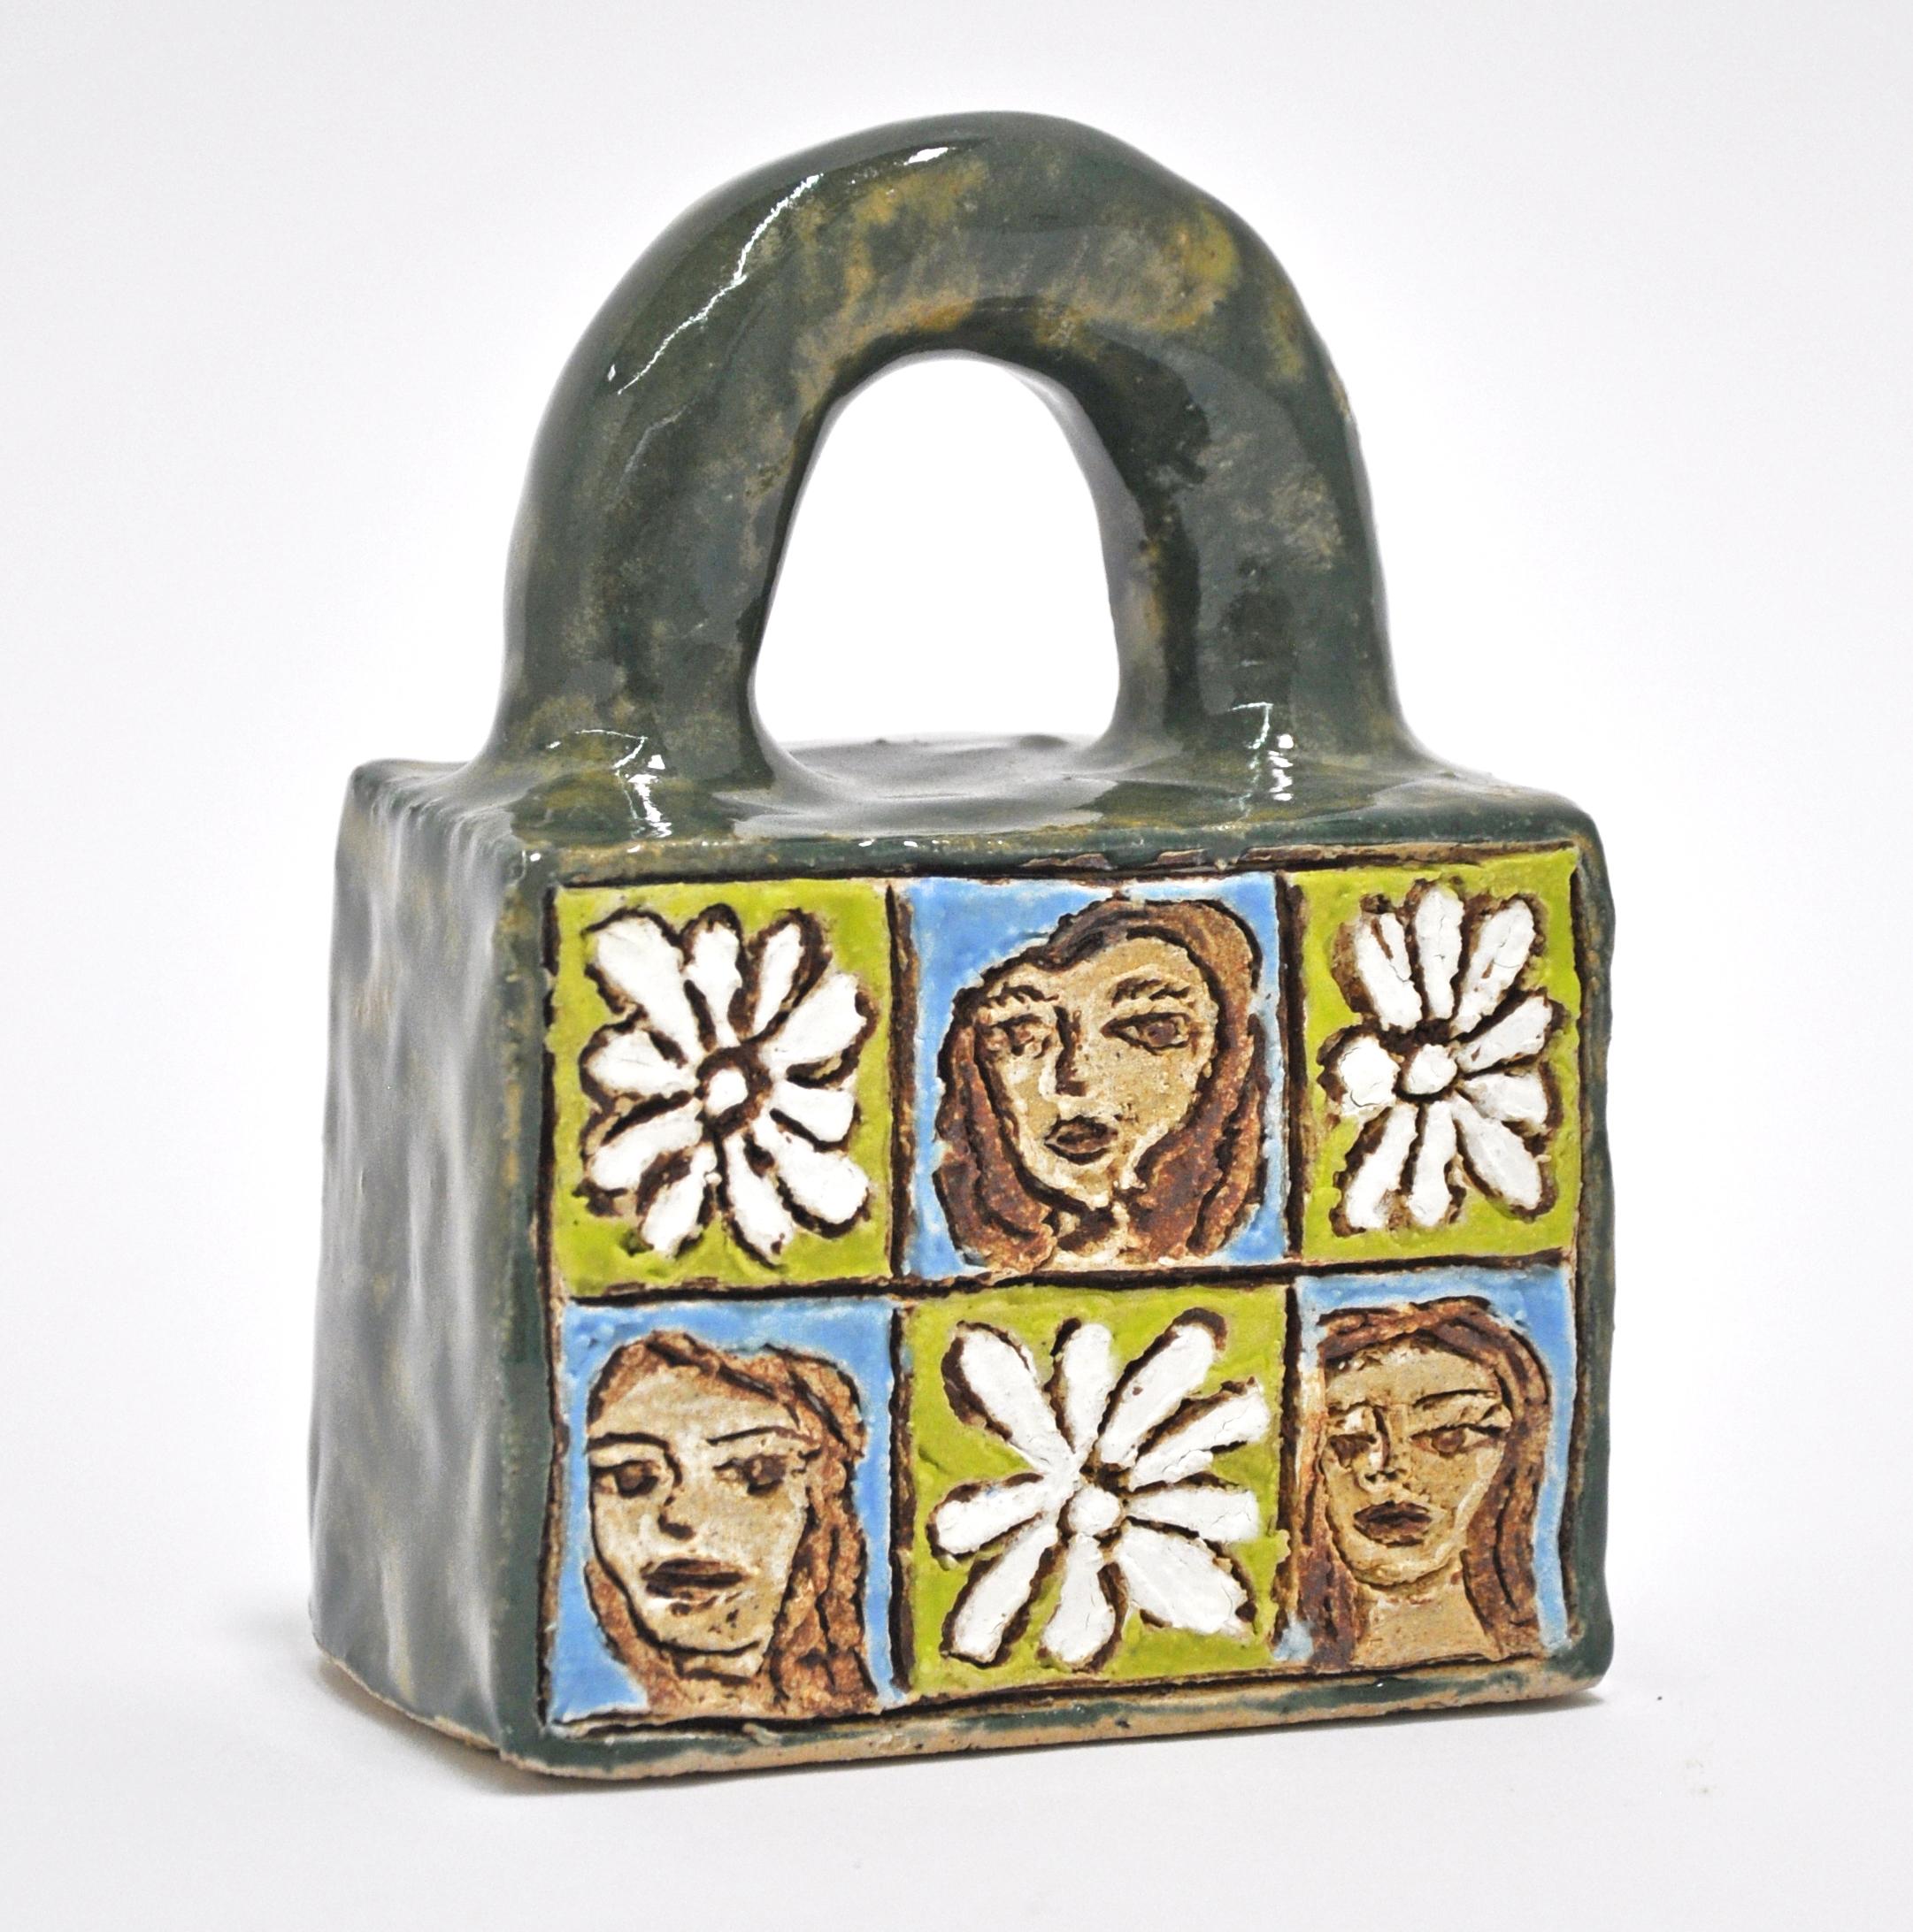 "Maryam Yousif, ""Cosmic Handbag: Friendships"", glazed stoneware, 4 x 2.5 x 5 in, 2019, $600"